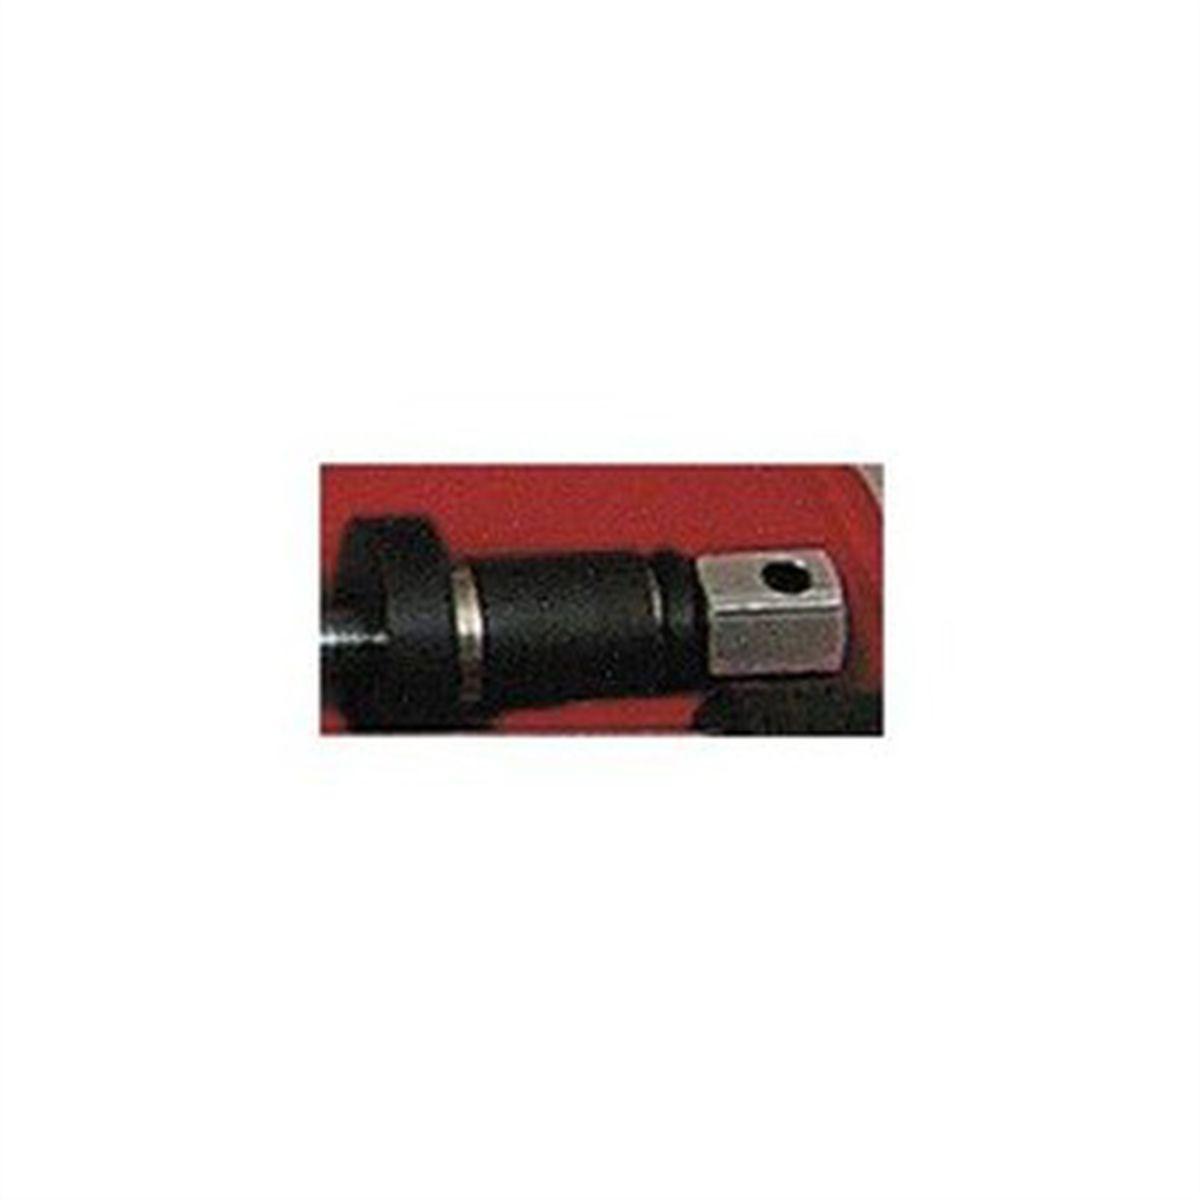 Lisle Universal Camshaft Bearing Tool #18000